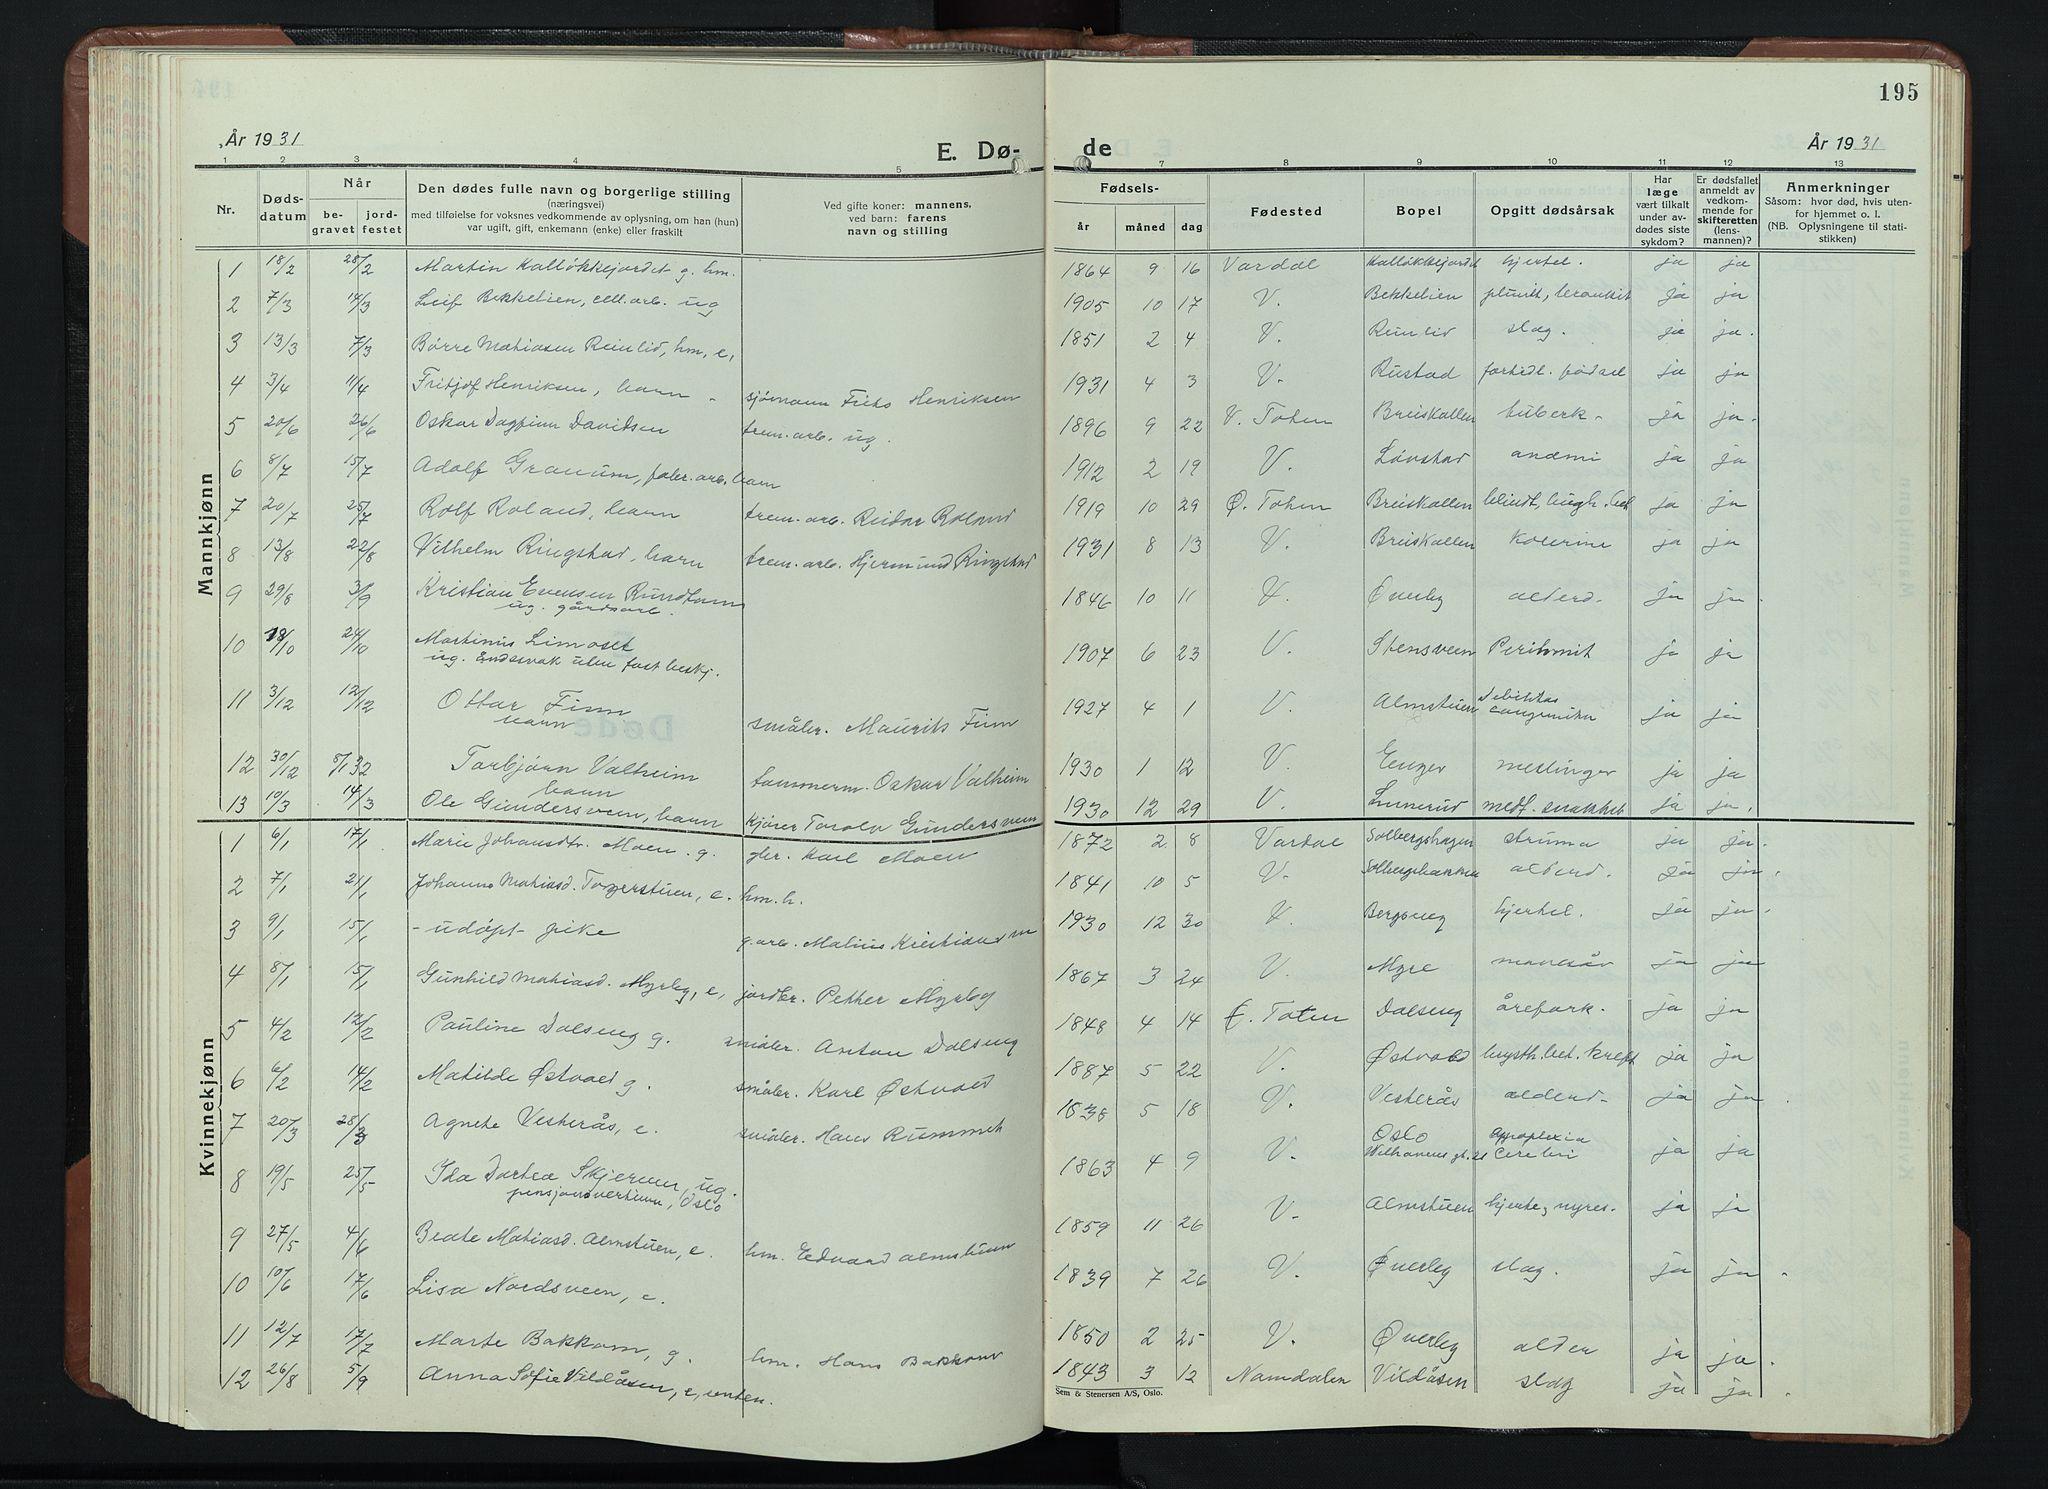 SAH, Vardal prestekontor, H/Ha/Hab/L0018: Klokkerbok nr. 18, 1931-1951, s. 195